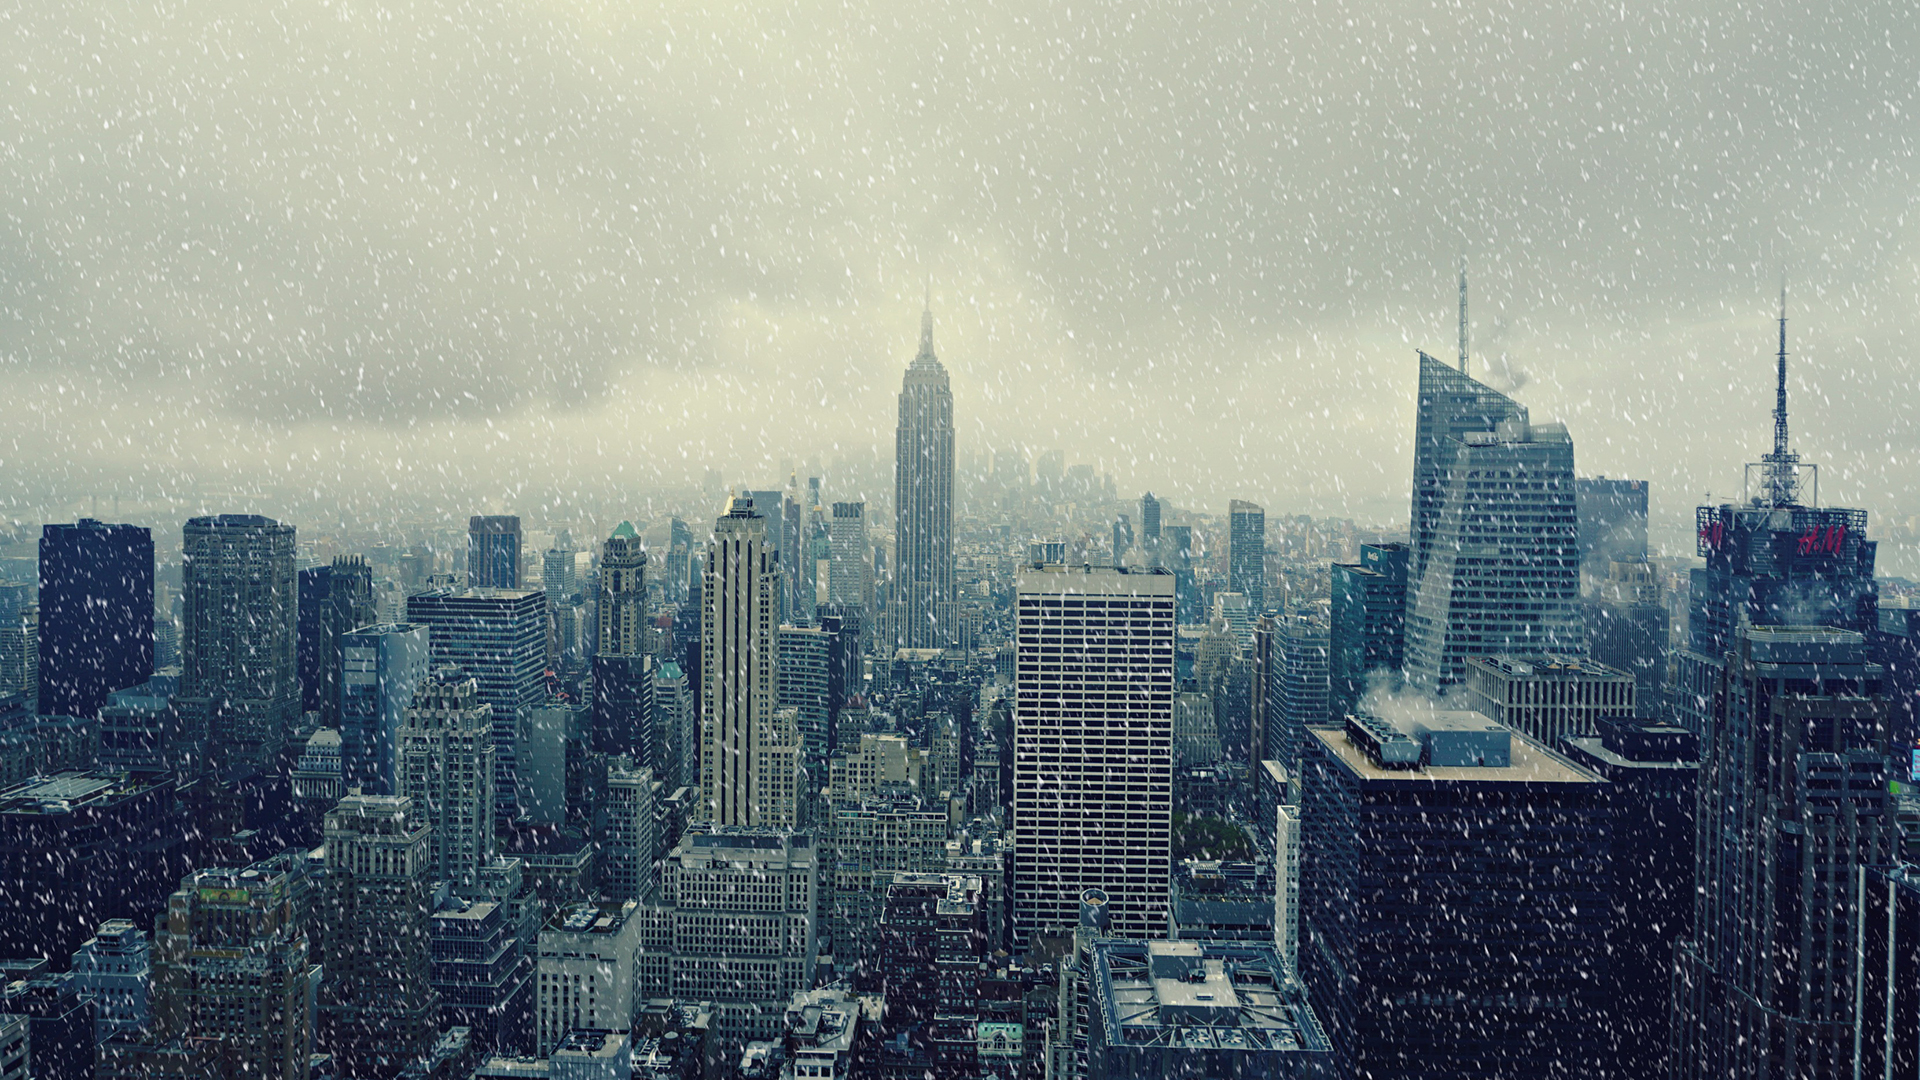 Très Fond d'ecran New-York sous la neige - Wallpaper VV44